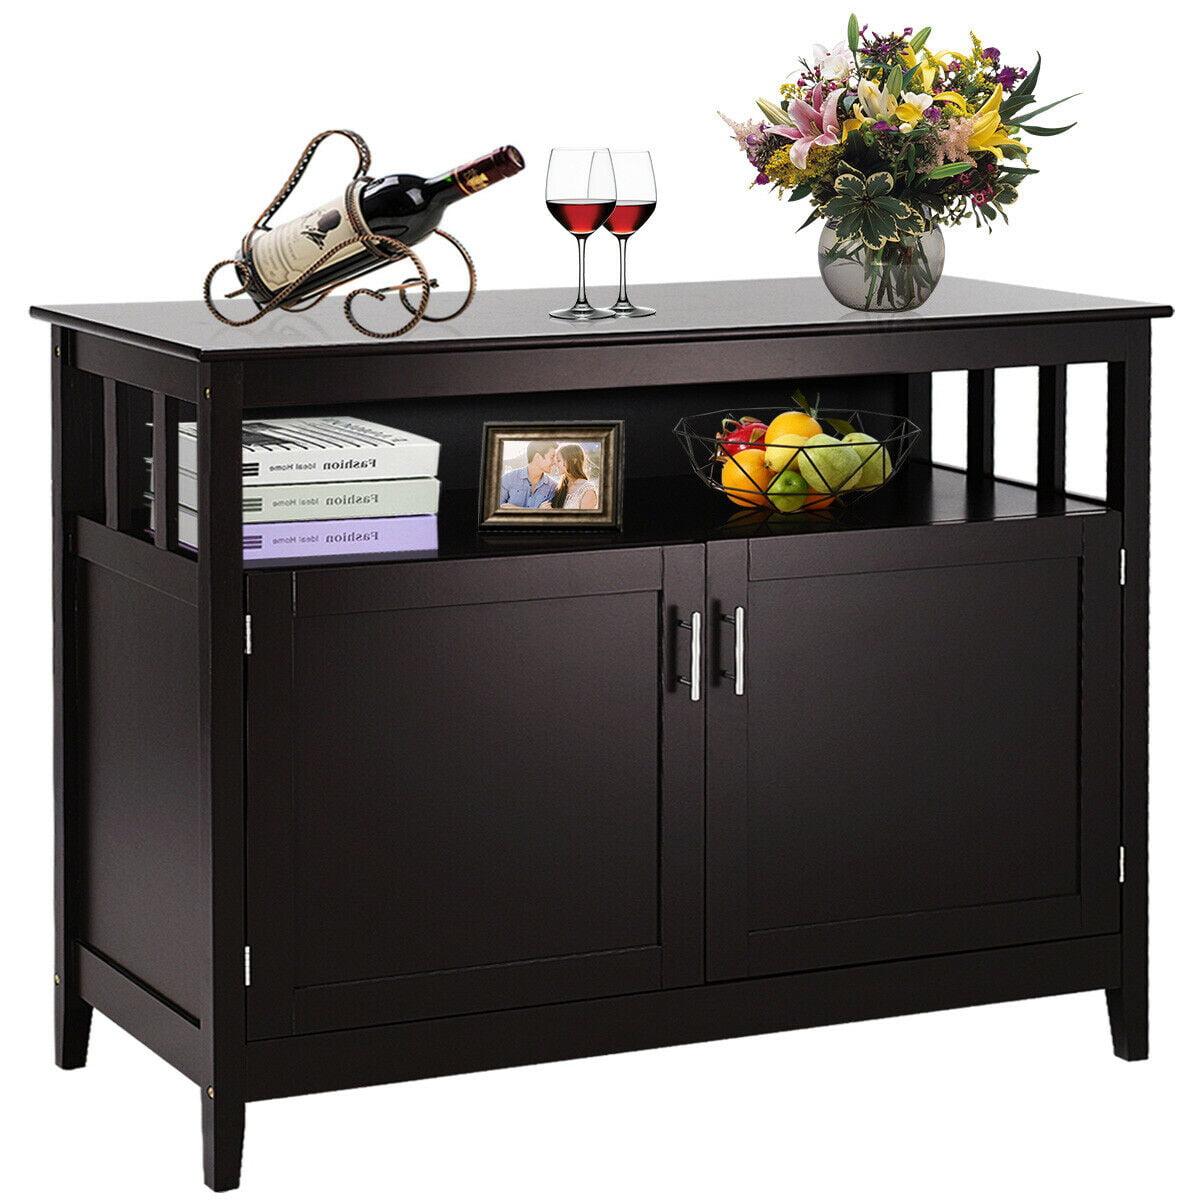 Picture of: Costway Modern Kitchen Storage Cabinet Buffet Server Table Sideboard Dining Wood Brown Walmart Com Walmart Com